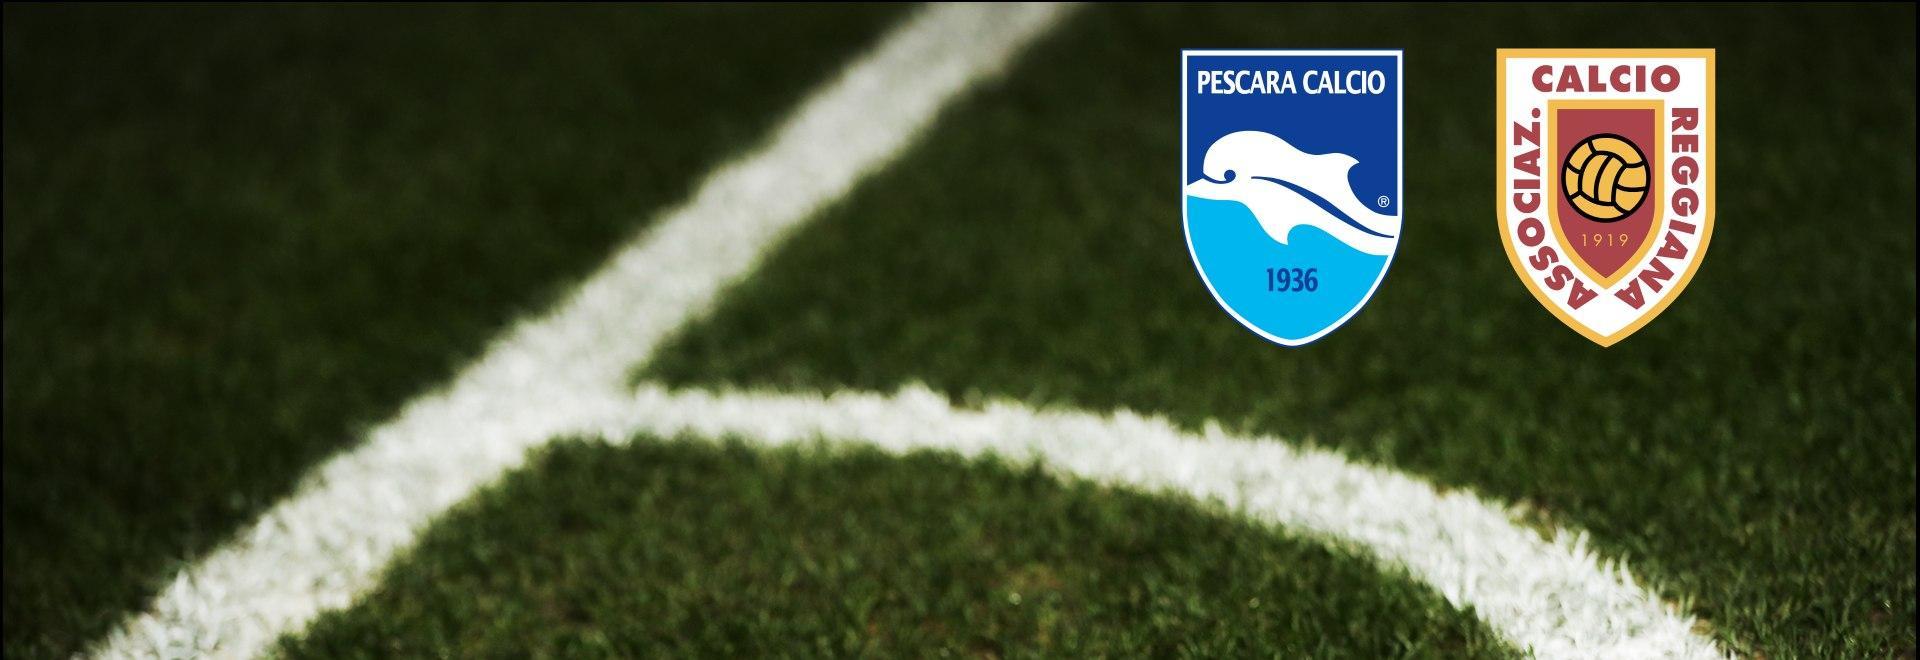 Pescara - Reggiana. 36a g.